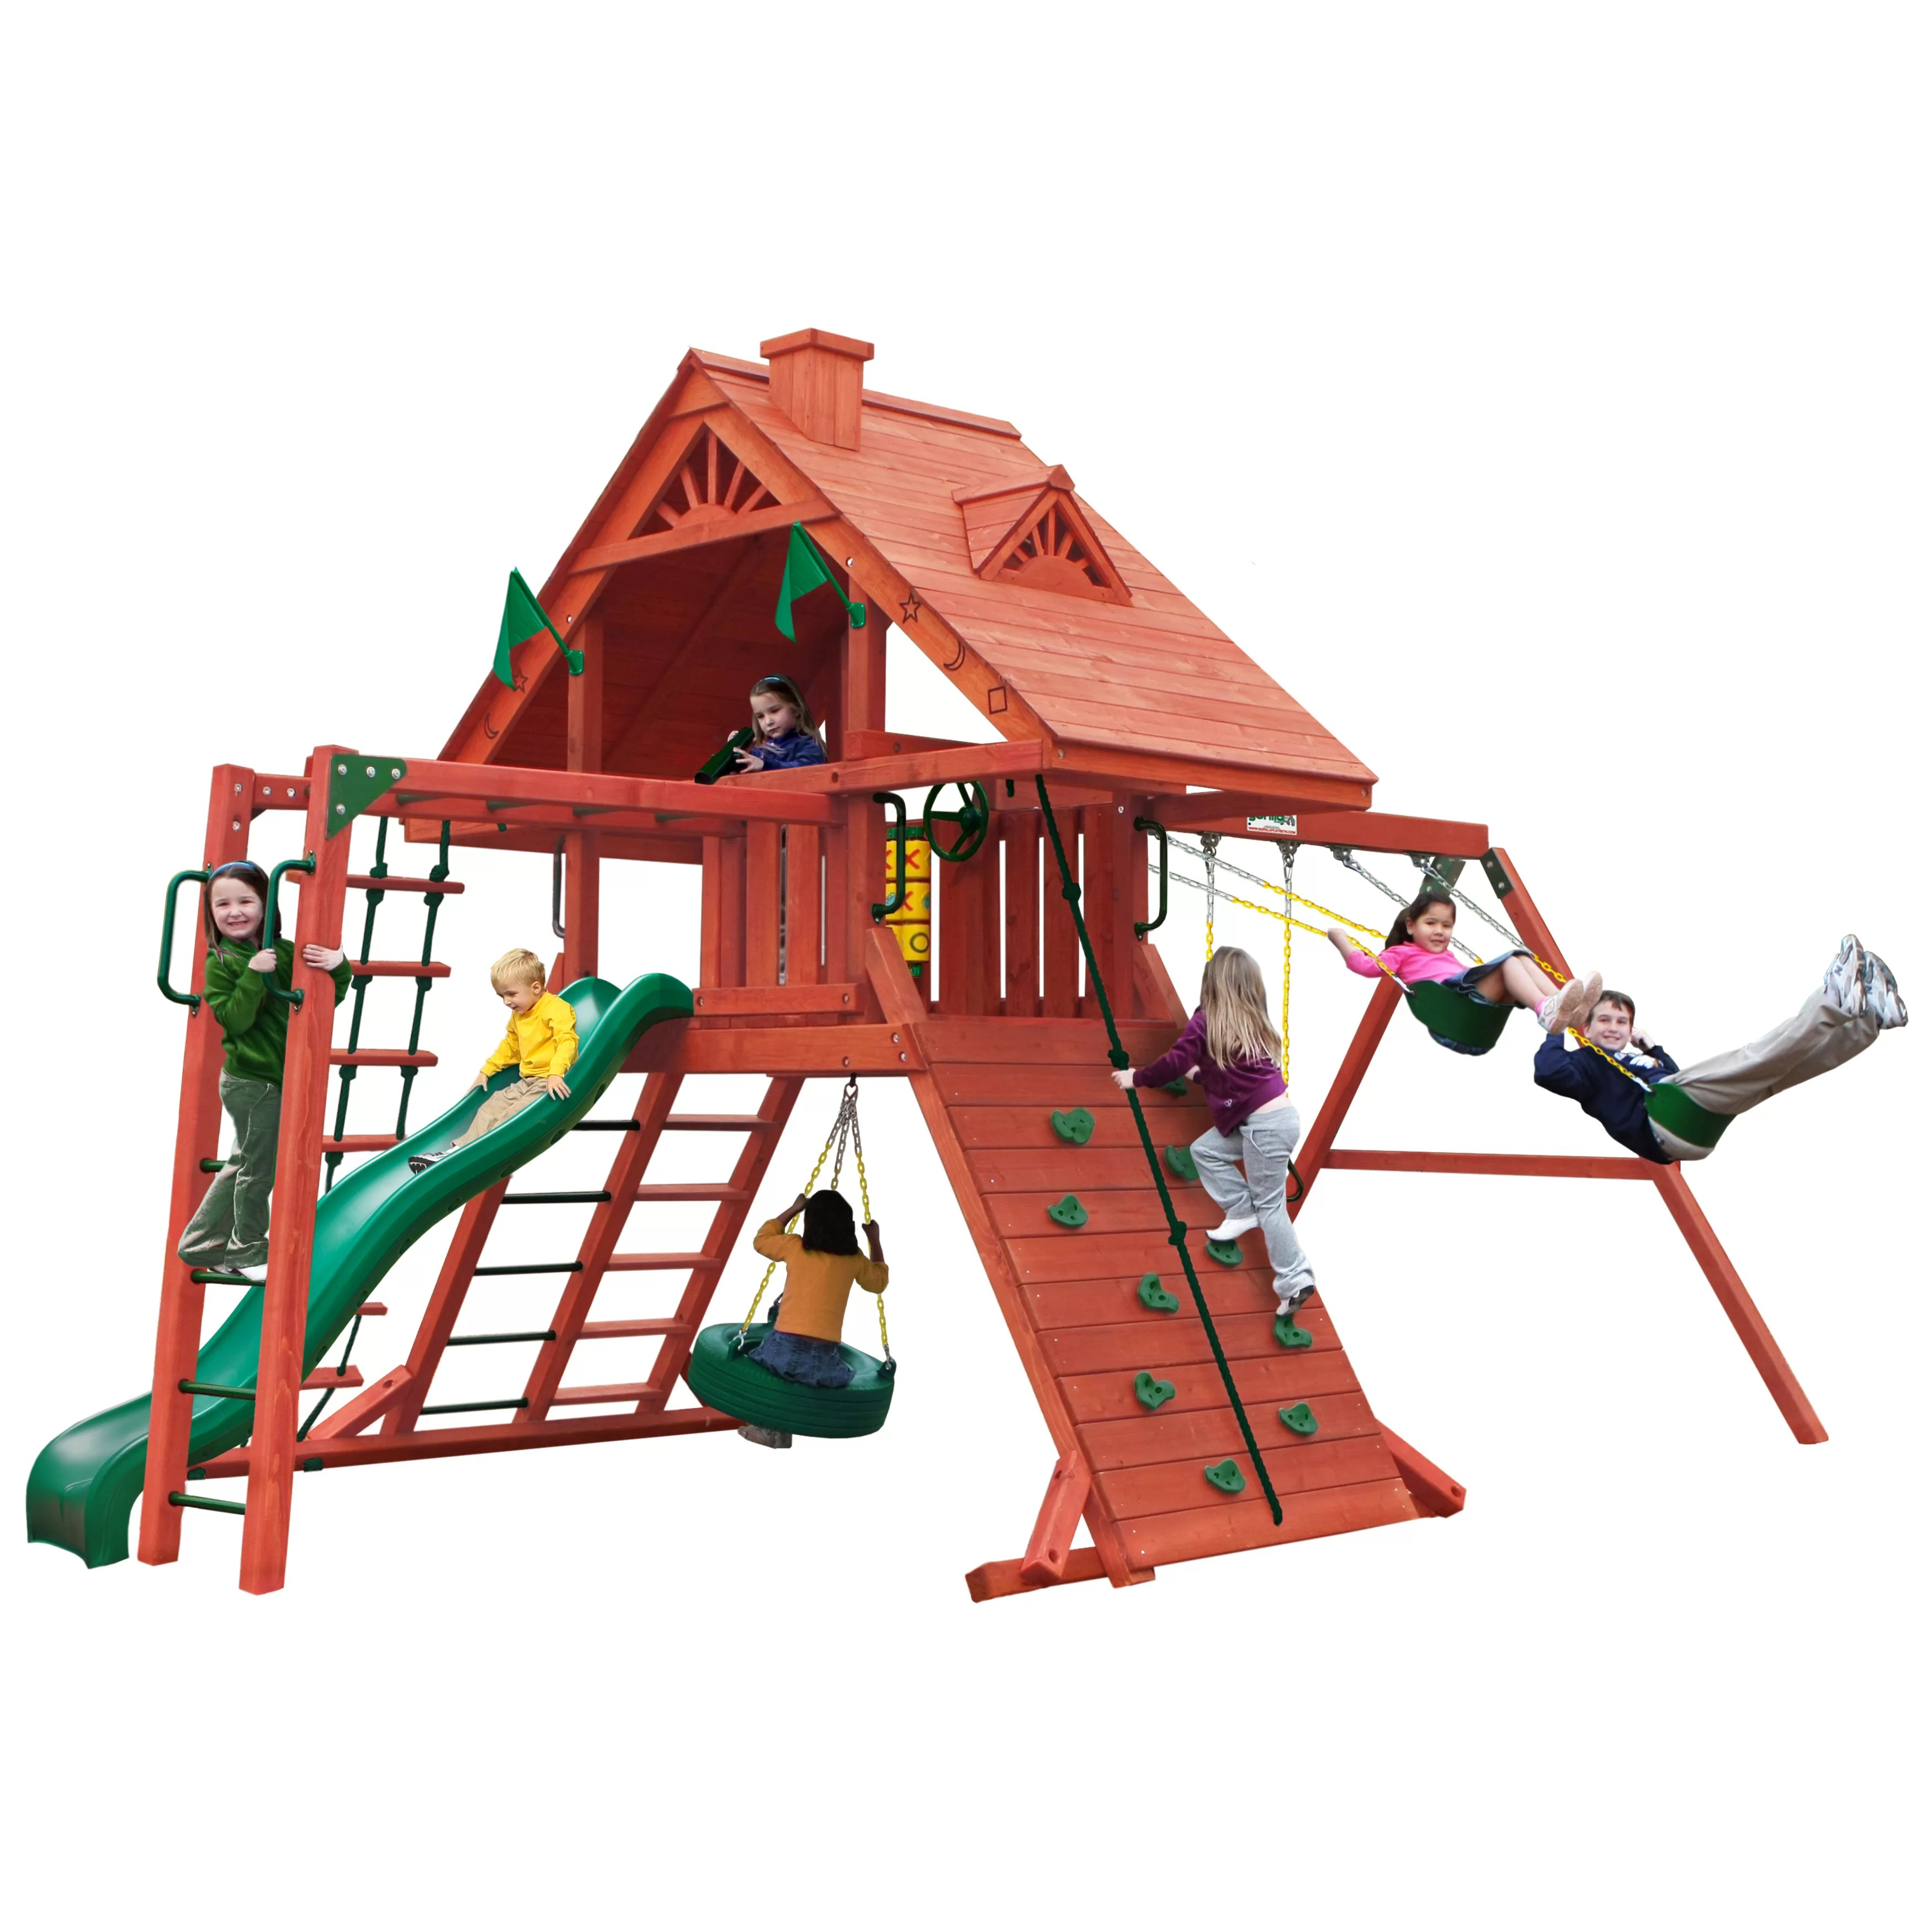 Gorilla Swing Sets